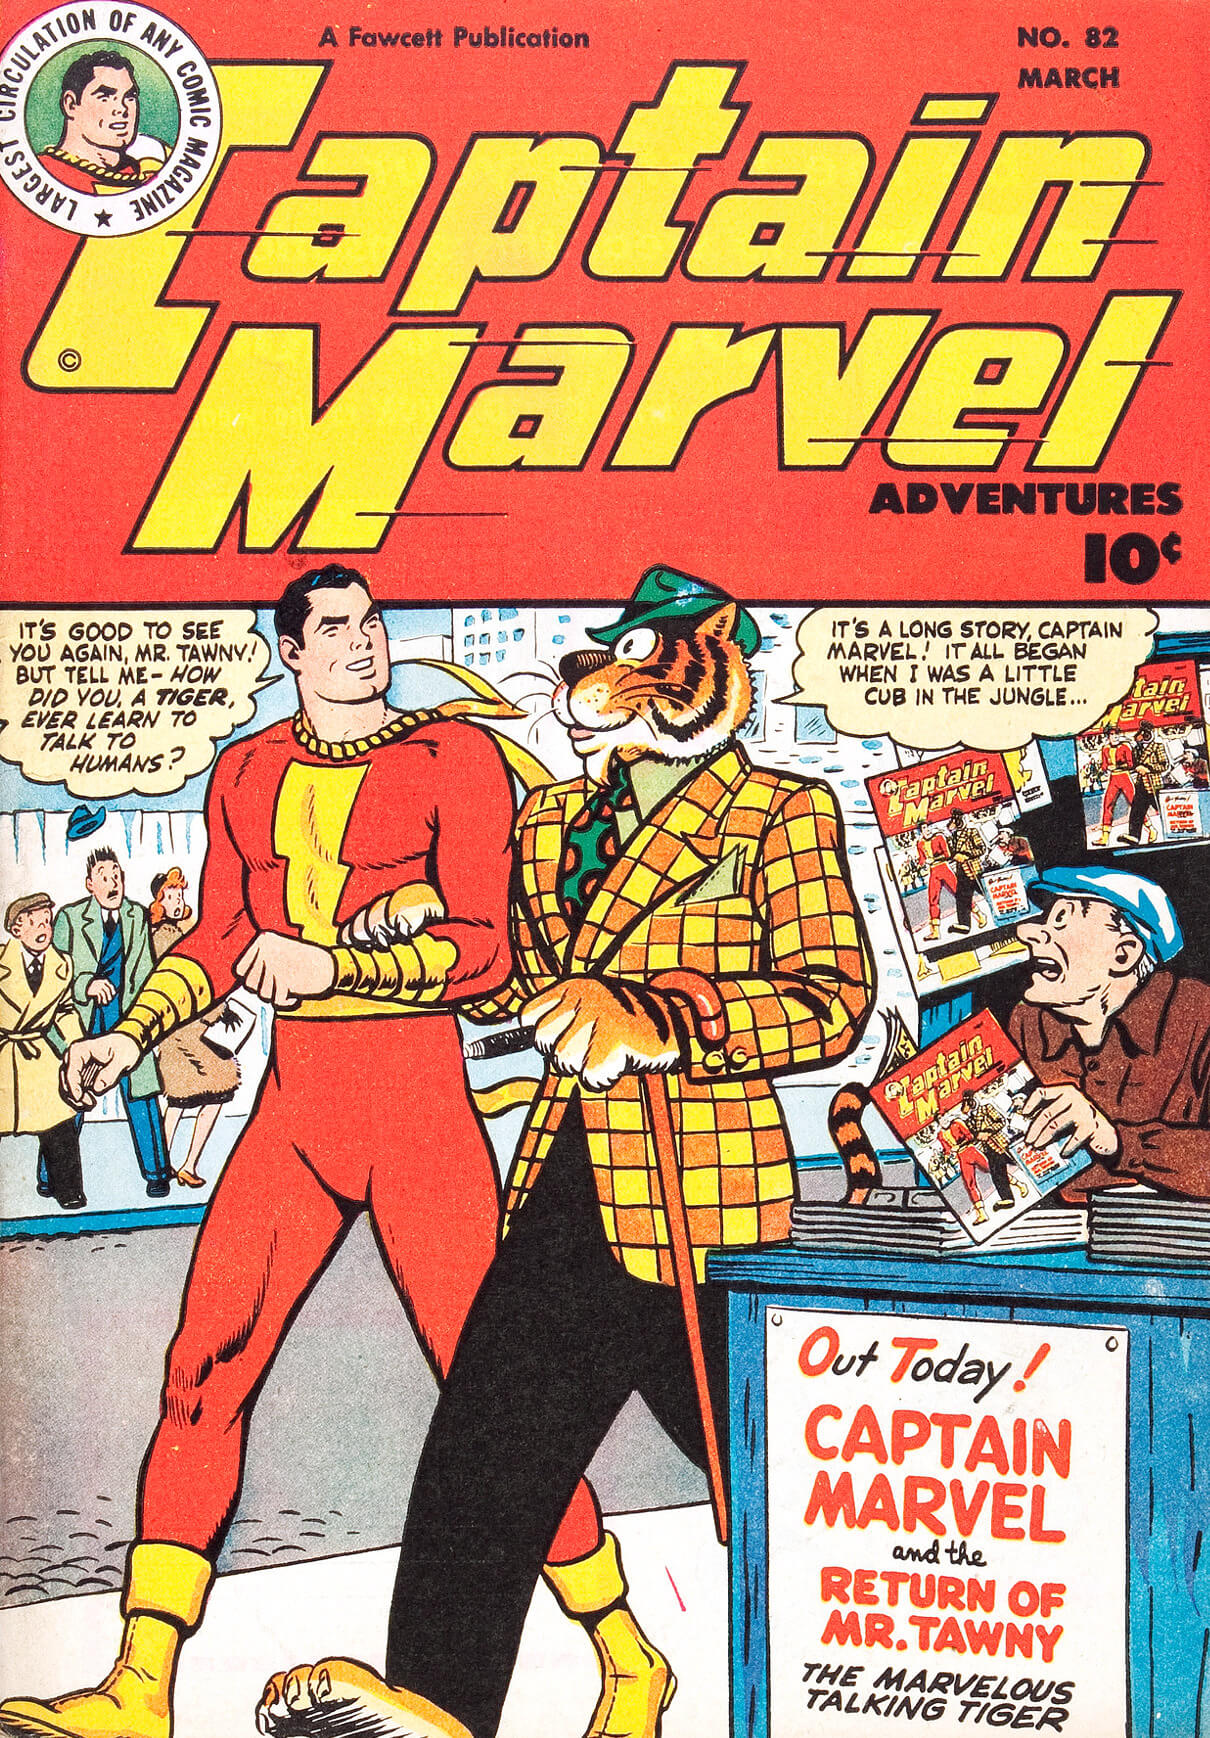 Captain Marvel Adventures 82.jpg